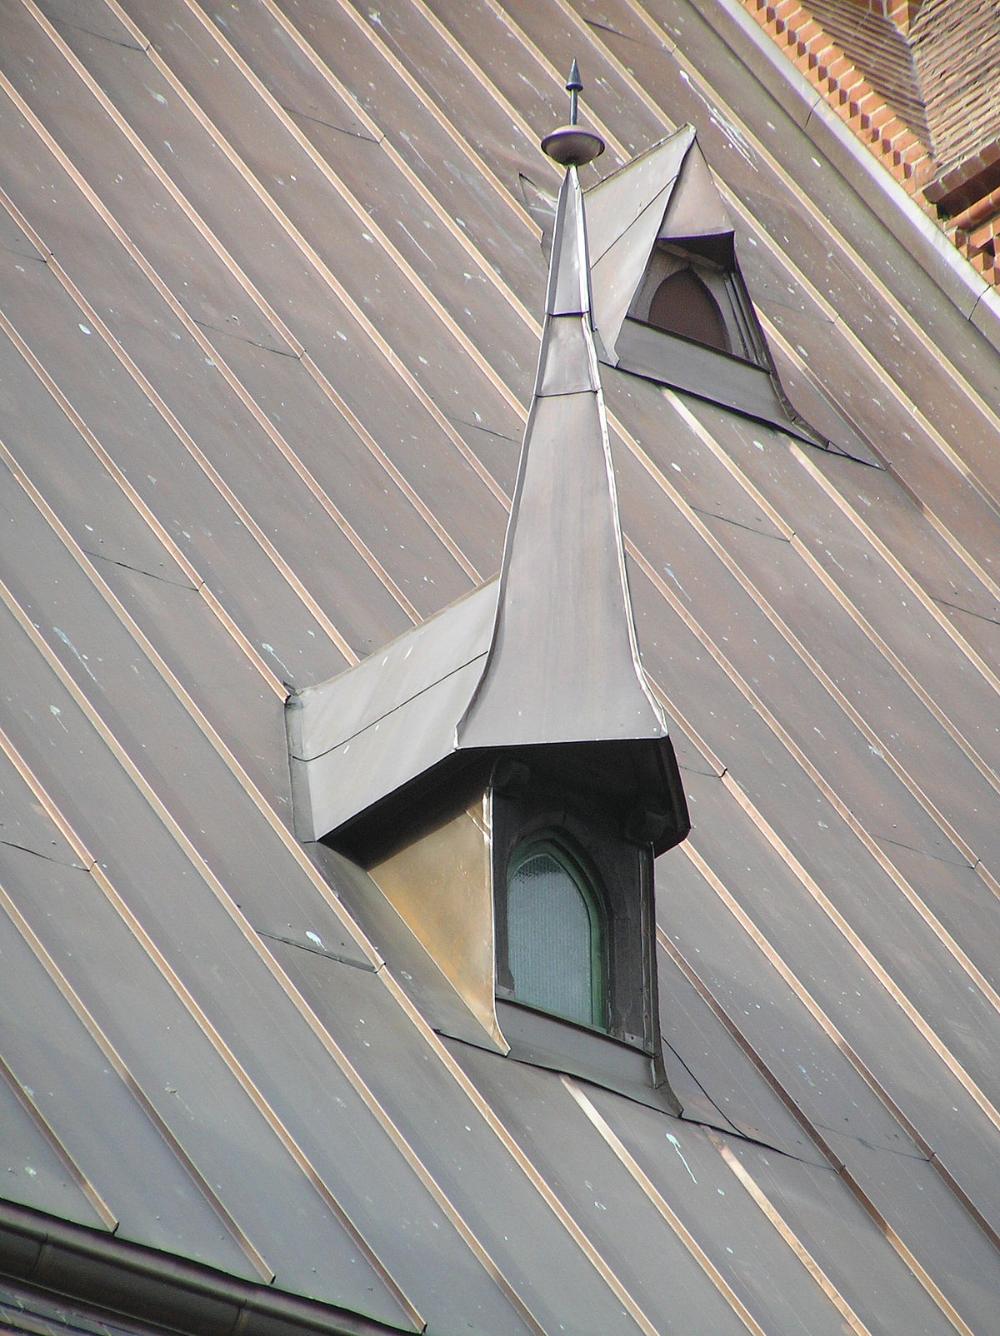 Metal Roof Wikipedia Metal Roof Zinc Roof Roofing